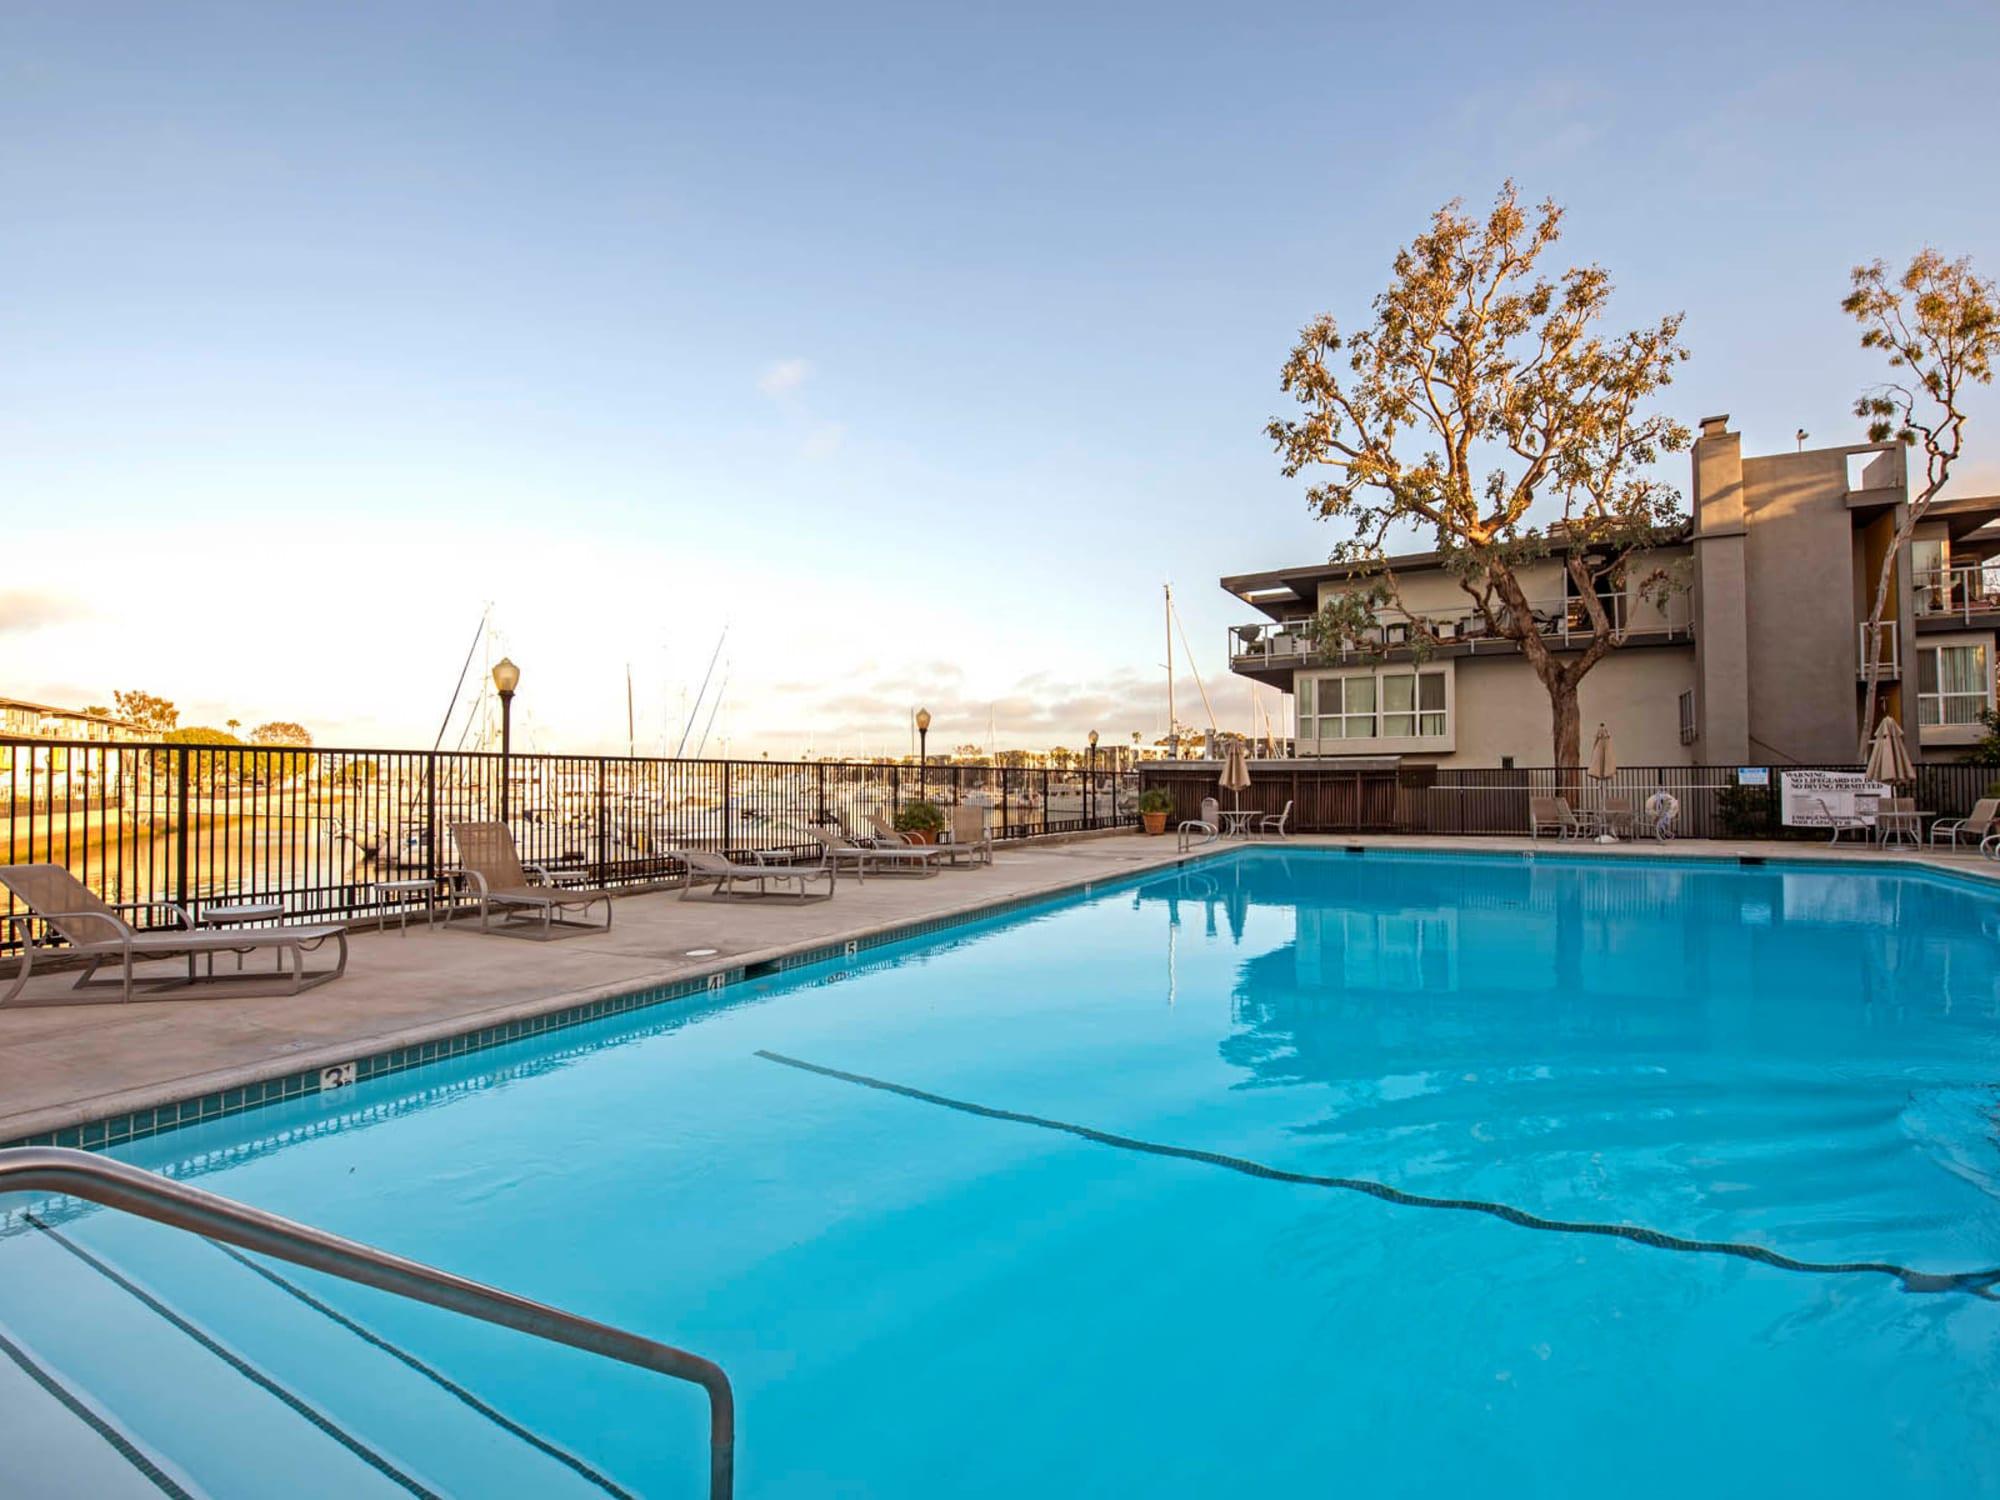 Swimming pool overlooking the marina at The Tides at Marina Harbor in Marina Del Rey, California